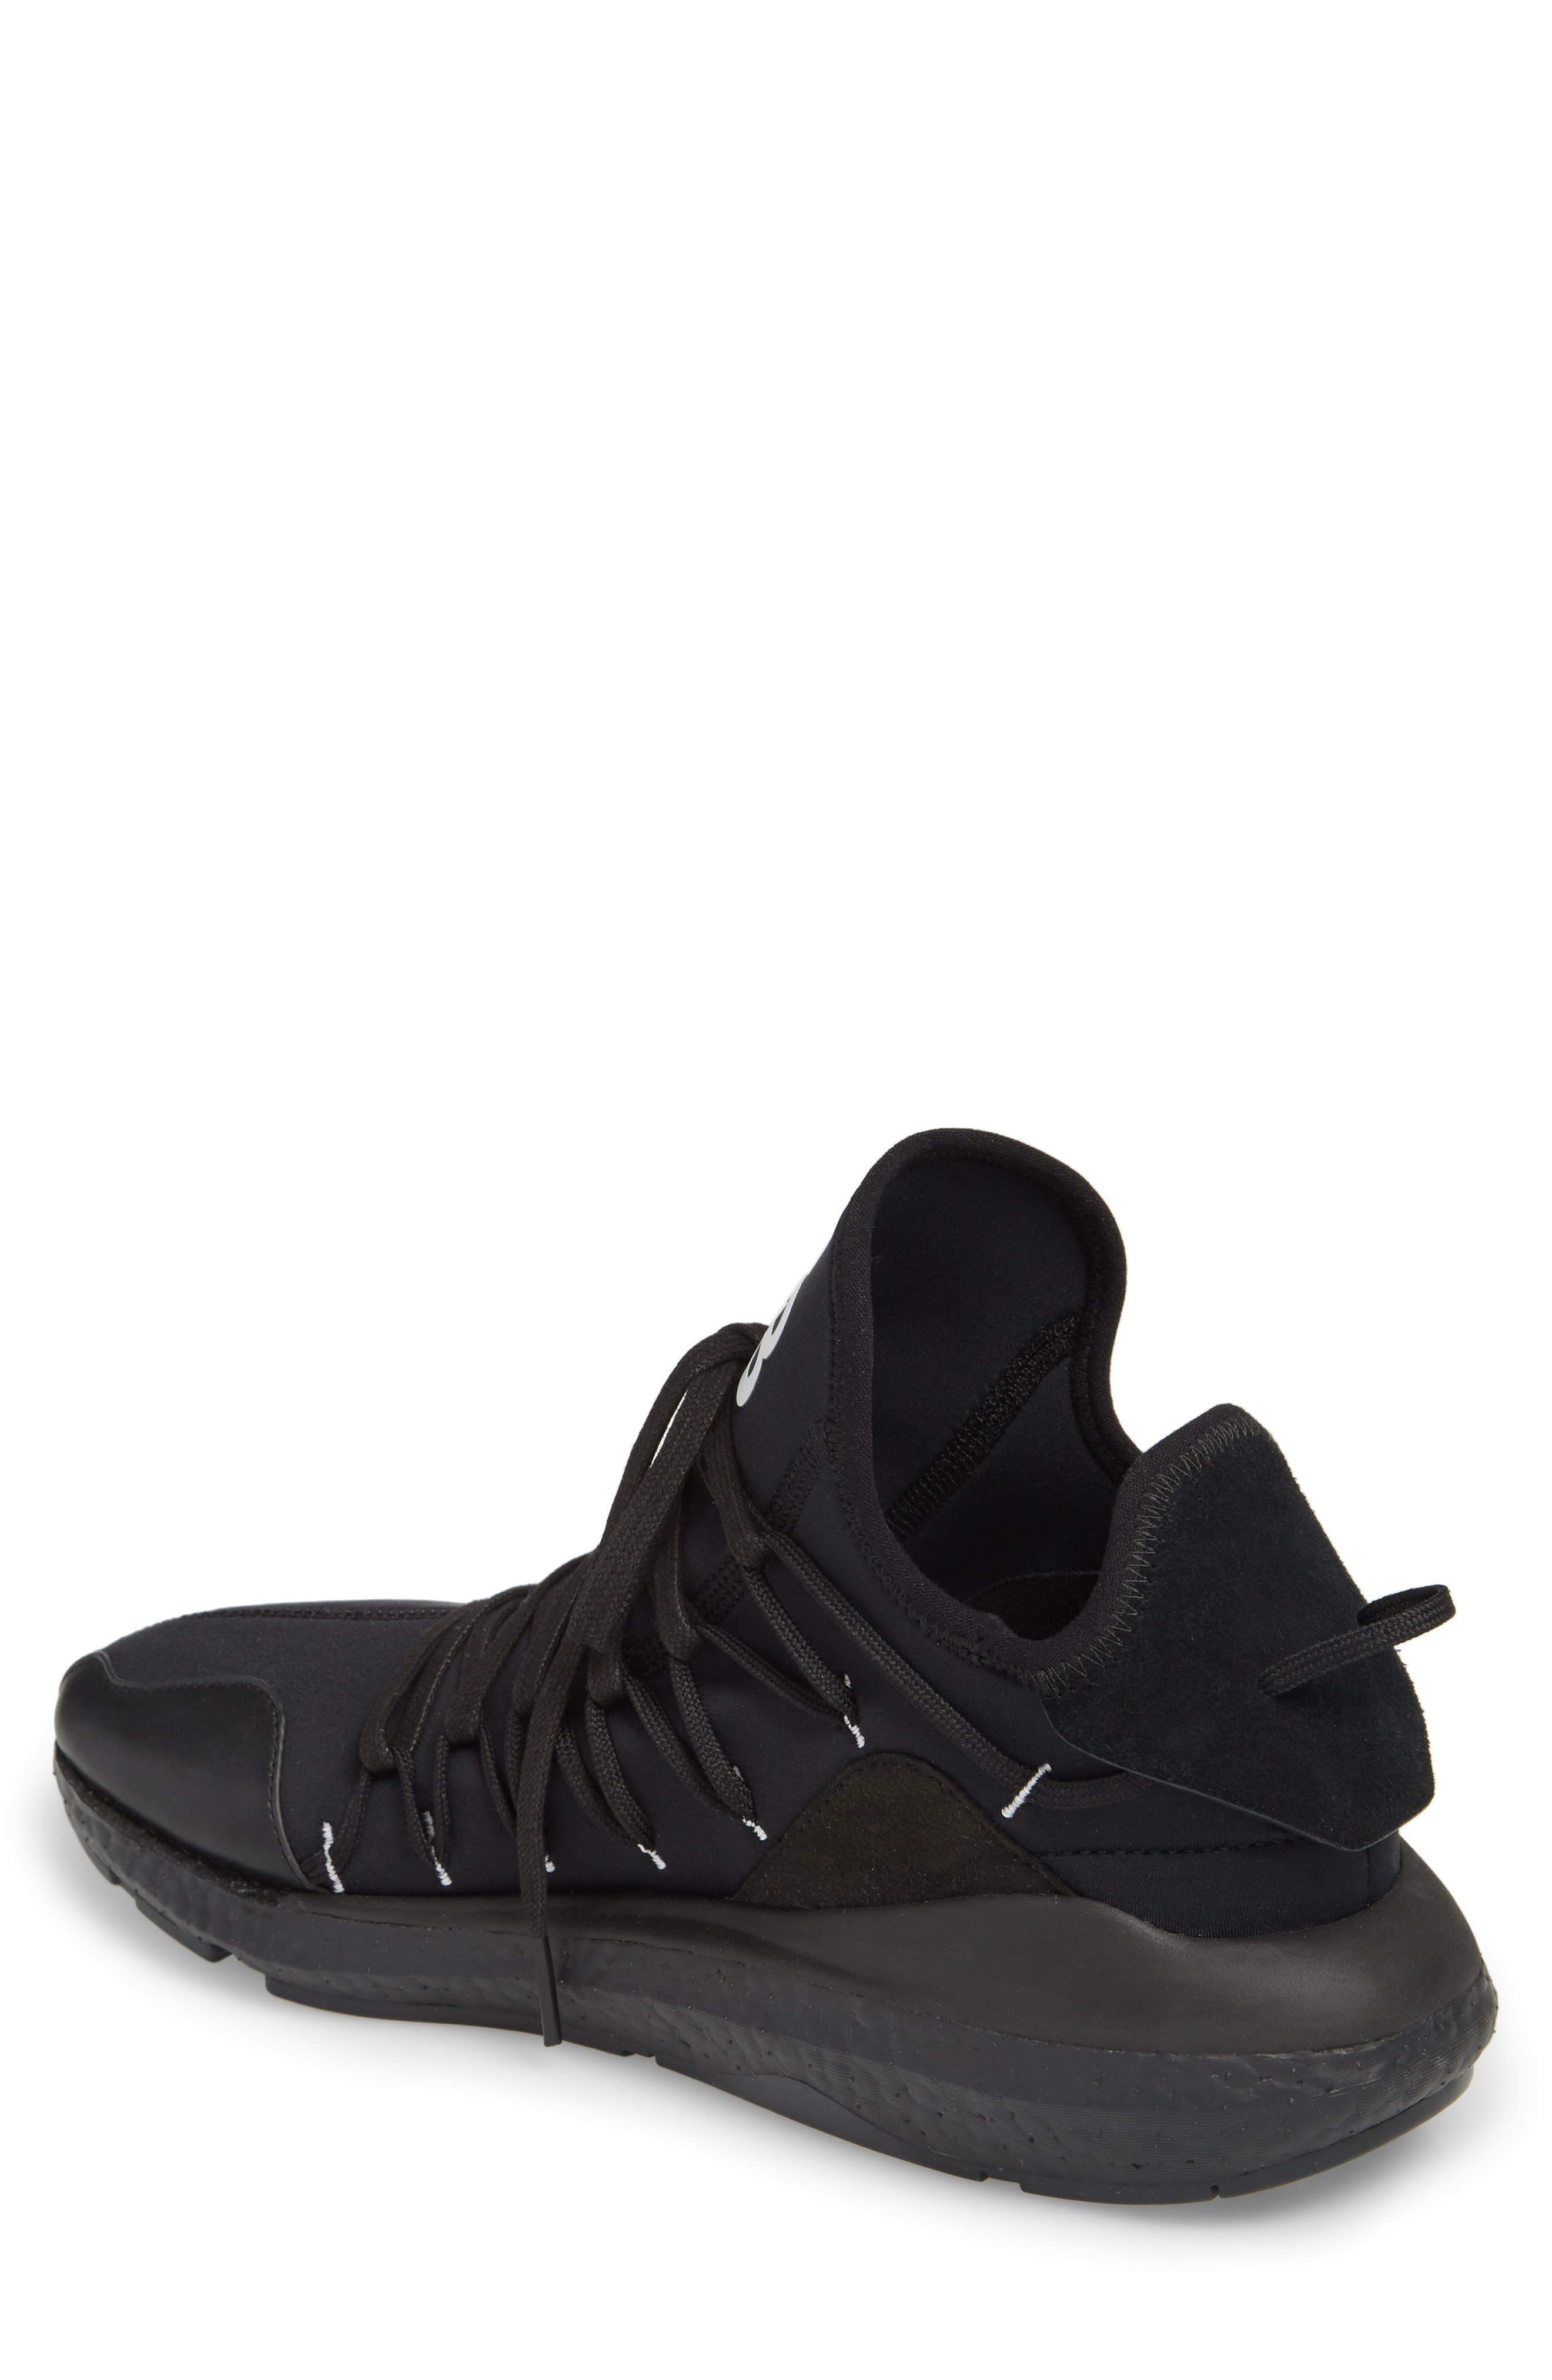 x adidas Kusari Sneaker,                             Alternate thumbnail 2, color,                             BLACK/BLACK